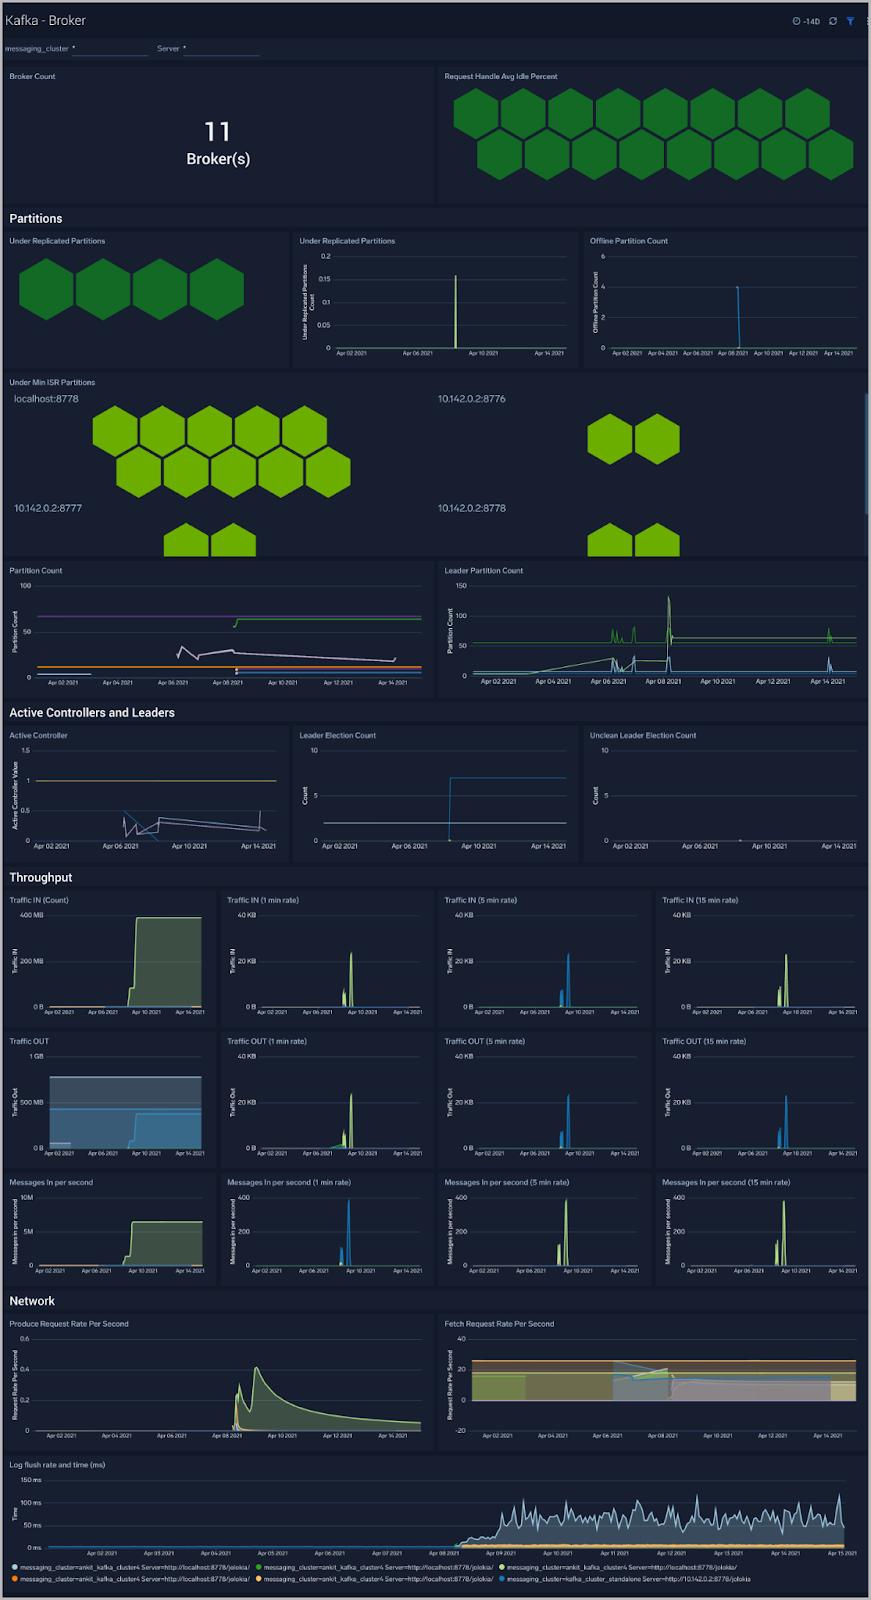 Broker - Monitoring Apache Kafka Clusters